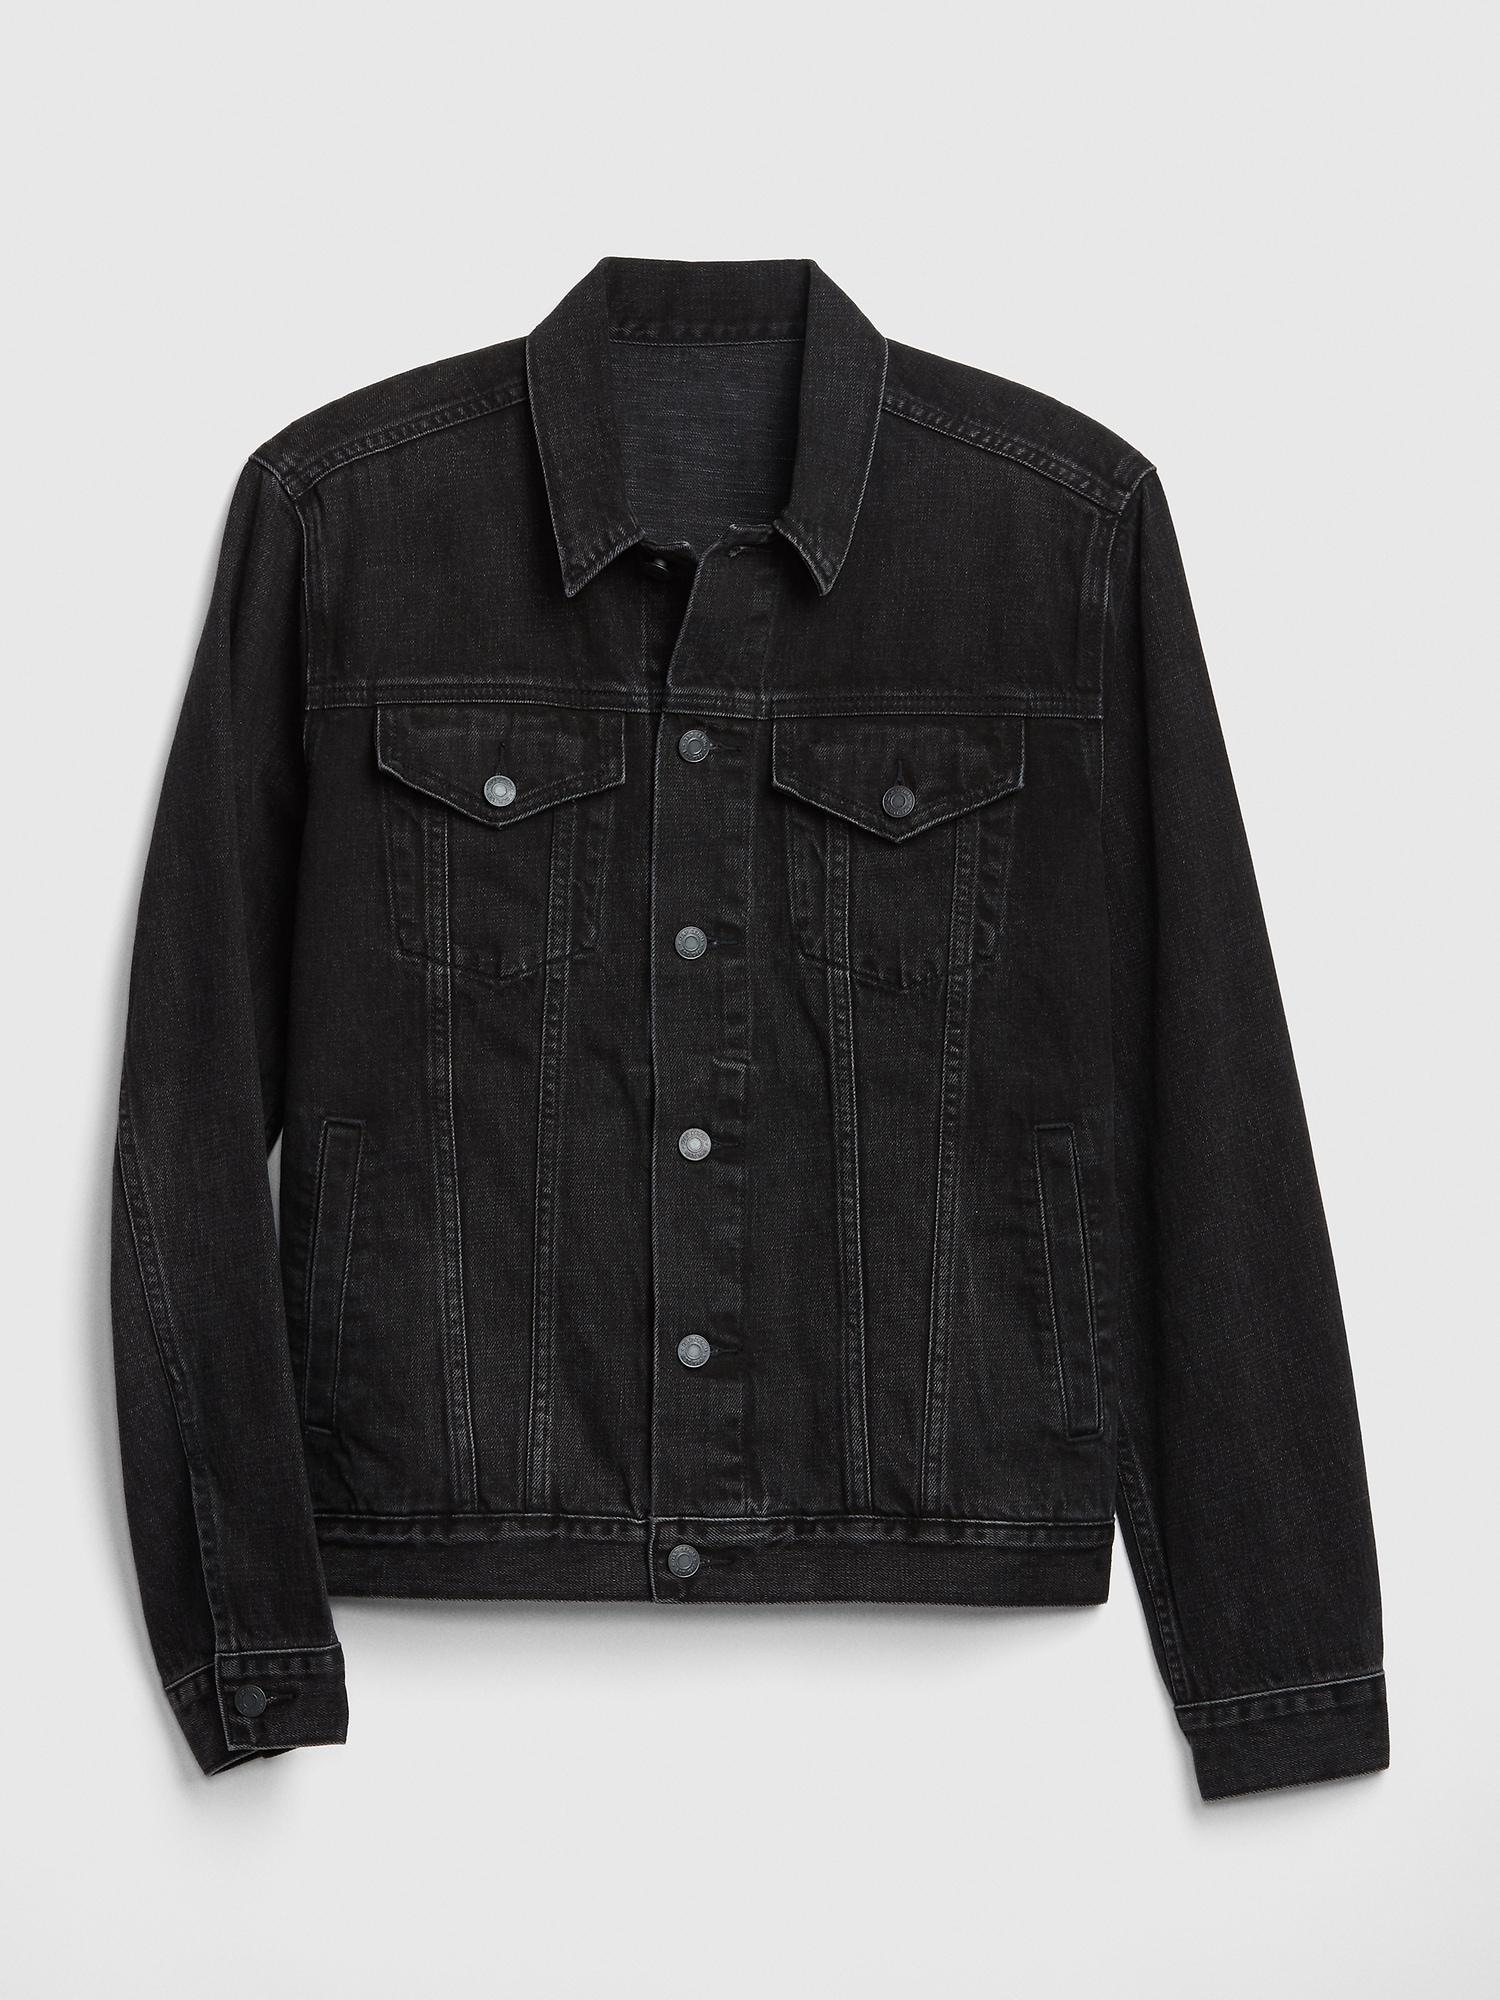 022b50189 Lyst - Gap Icon Denim Jacket in Black for Men